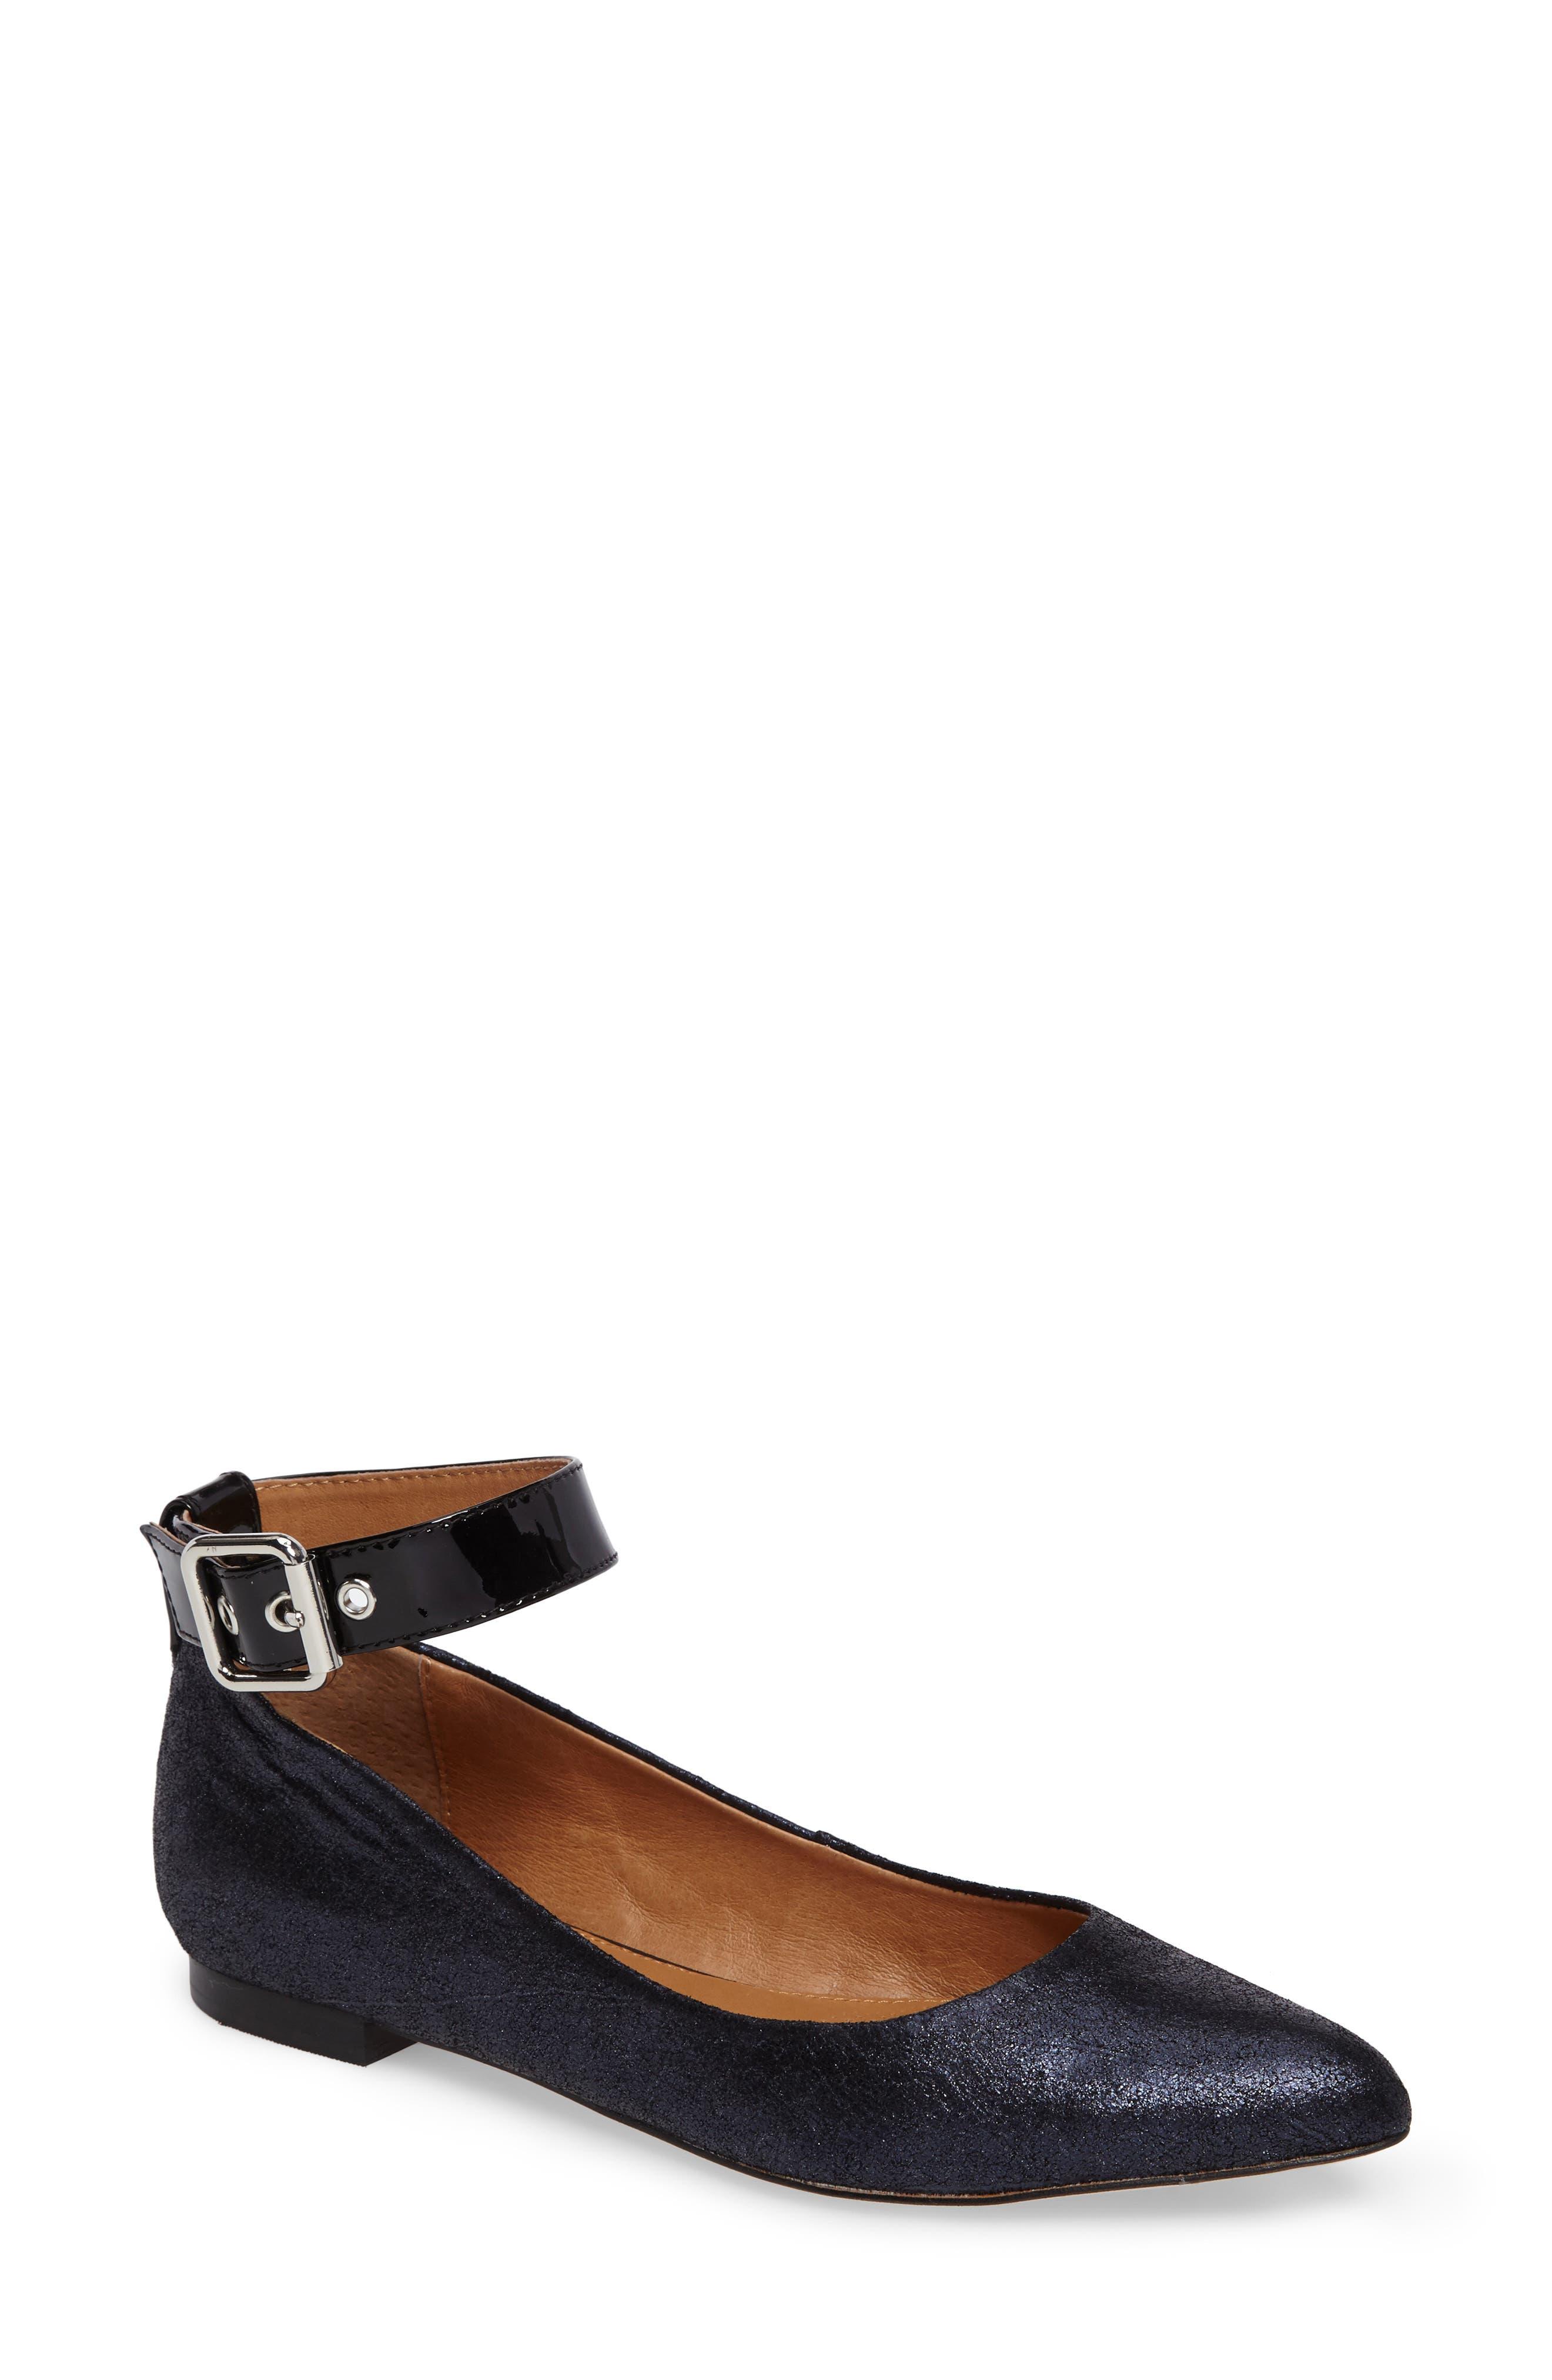 Alternate Image 1 Selected - Corso Como Ramona Ankle Strap Flat (Women)